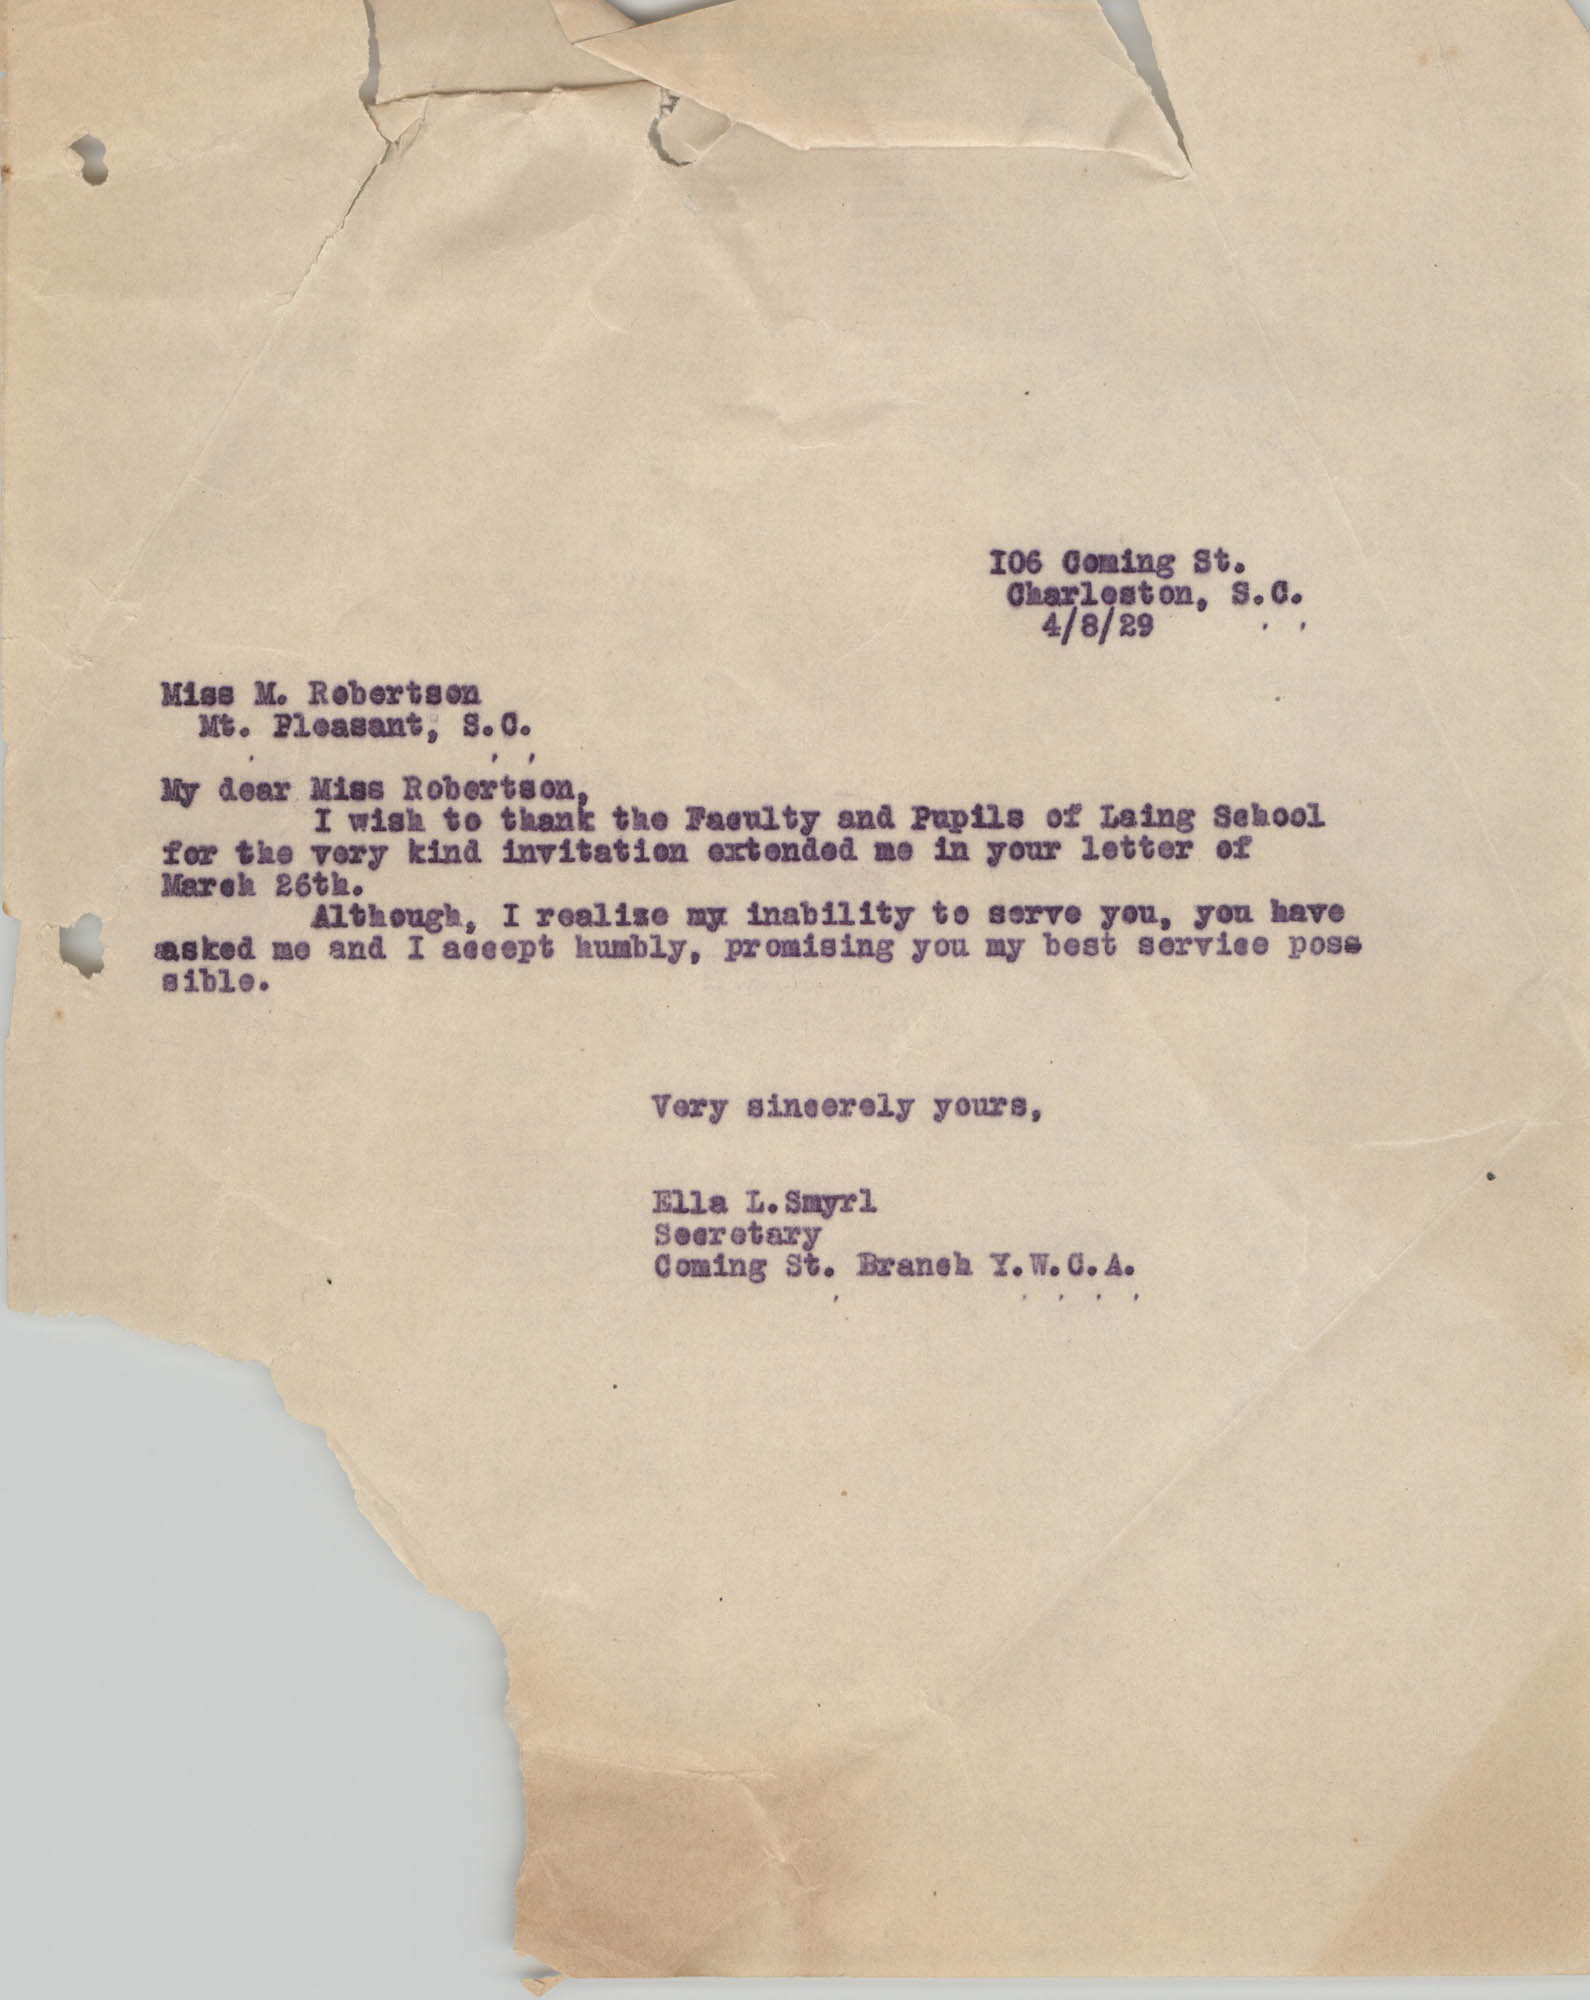 Letter from Ella L. Smyrl to M. Robertson, April 8, 1929